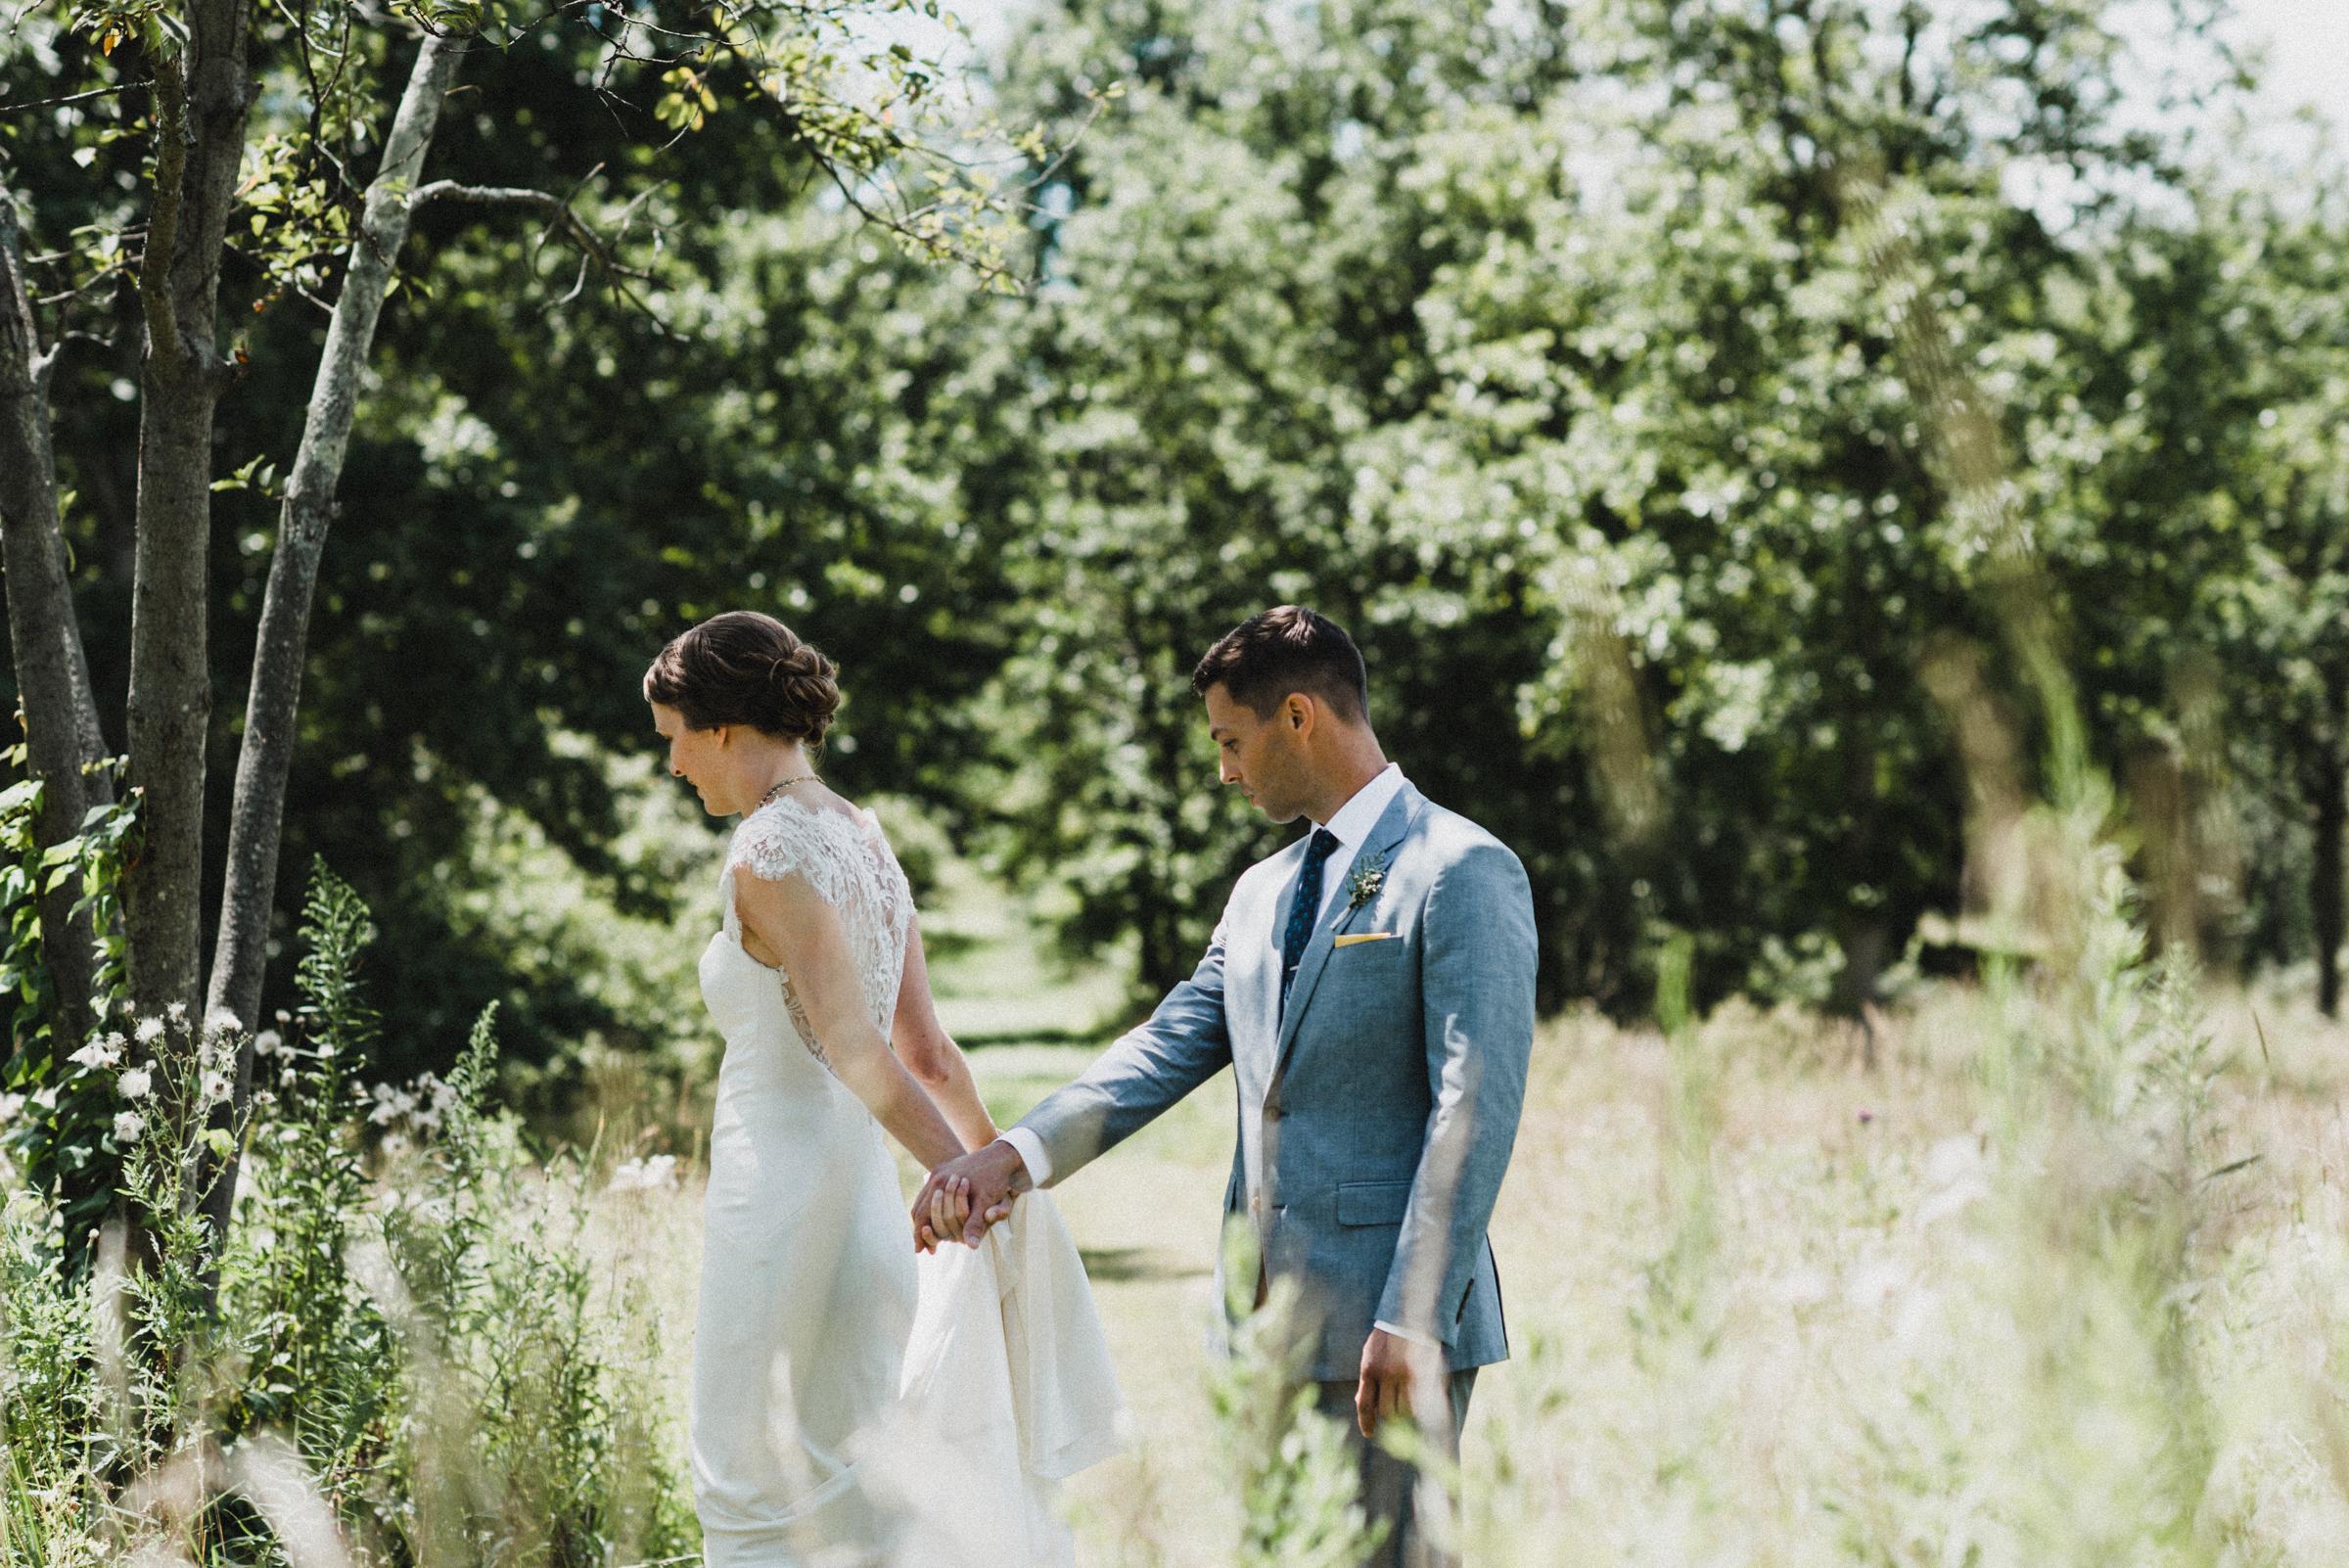 Intimate-Backyard-Farmhouse-Ohio-Wedding-Andi+Ben_Mallory+Justin-Photographers-64.JPG